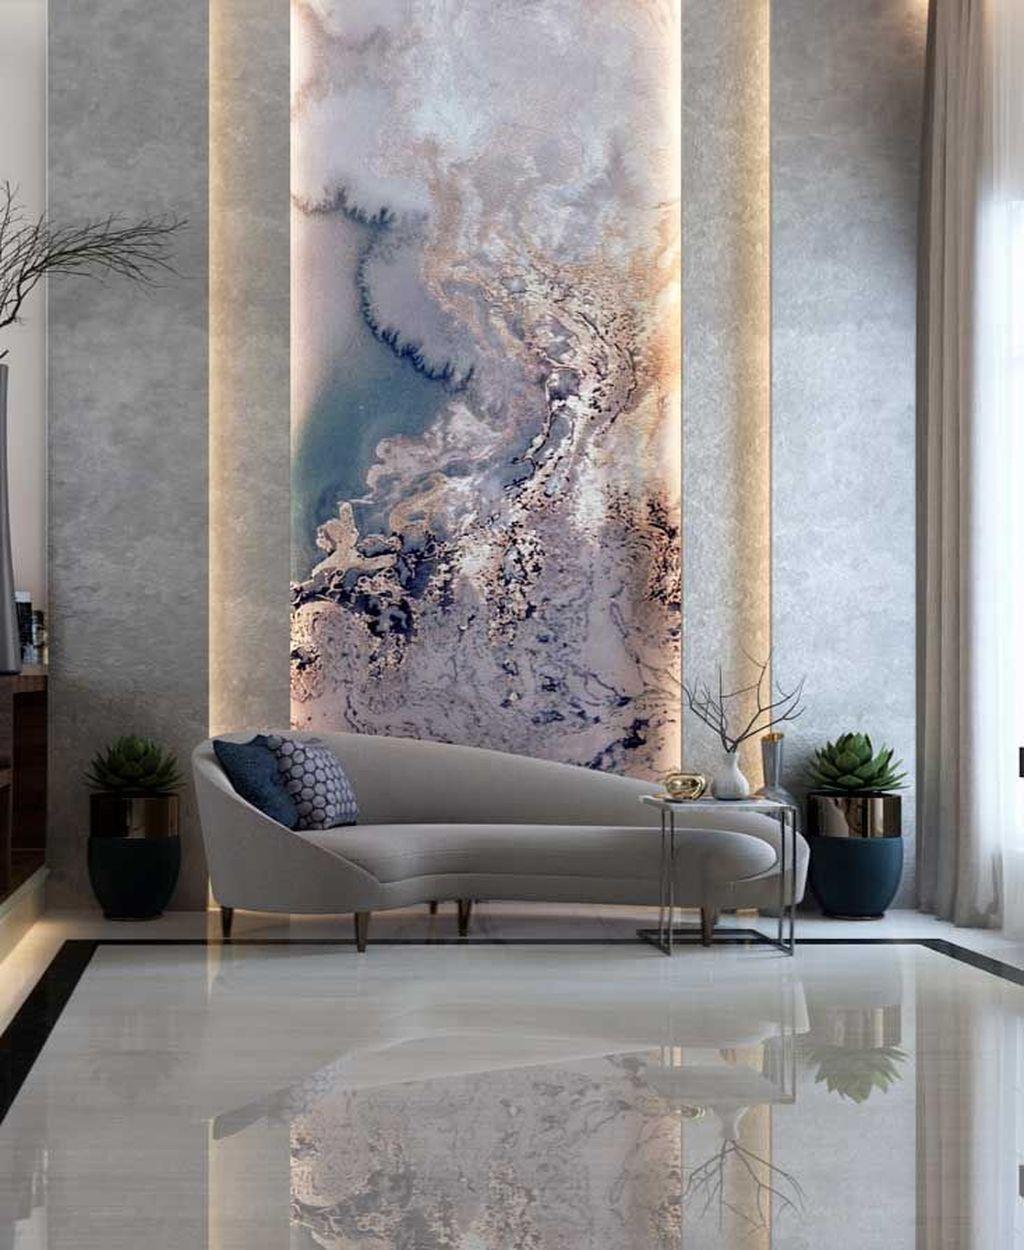 35 Gorgeous Living Room Wall Decor Ideas That Looks So Cute Living Room Design Decor Luxury Living Room Elegant Living Room